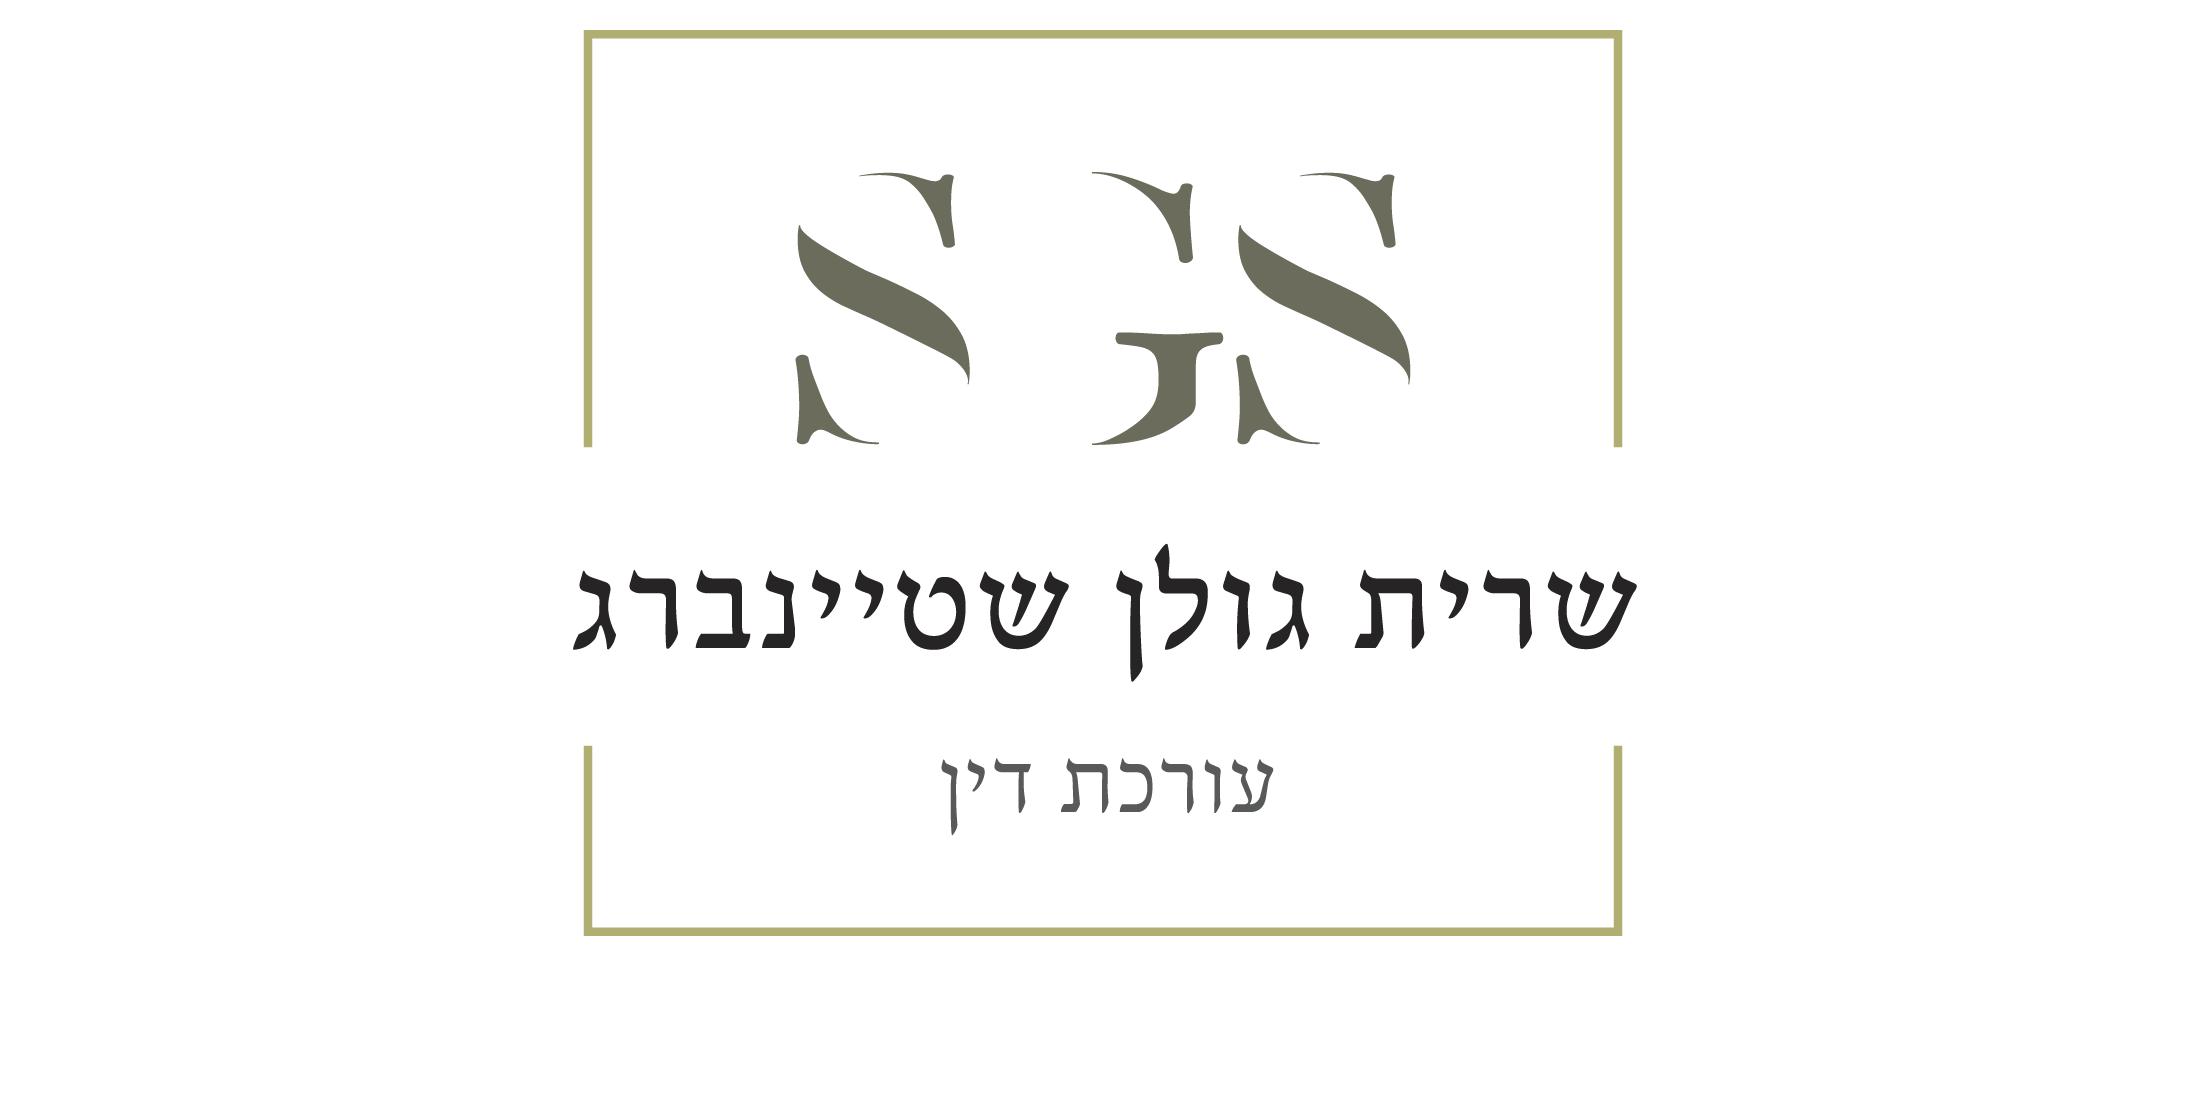 https://bigeyes.co.il/wp-content/uploads/2019/03/Sarit-Golan-adv-1.png